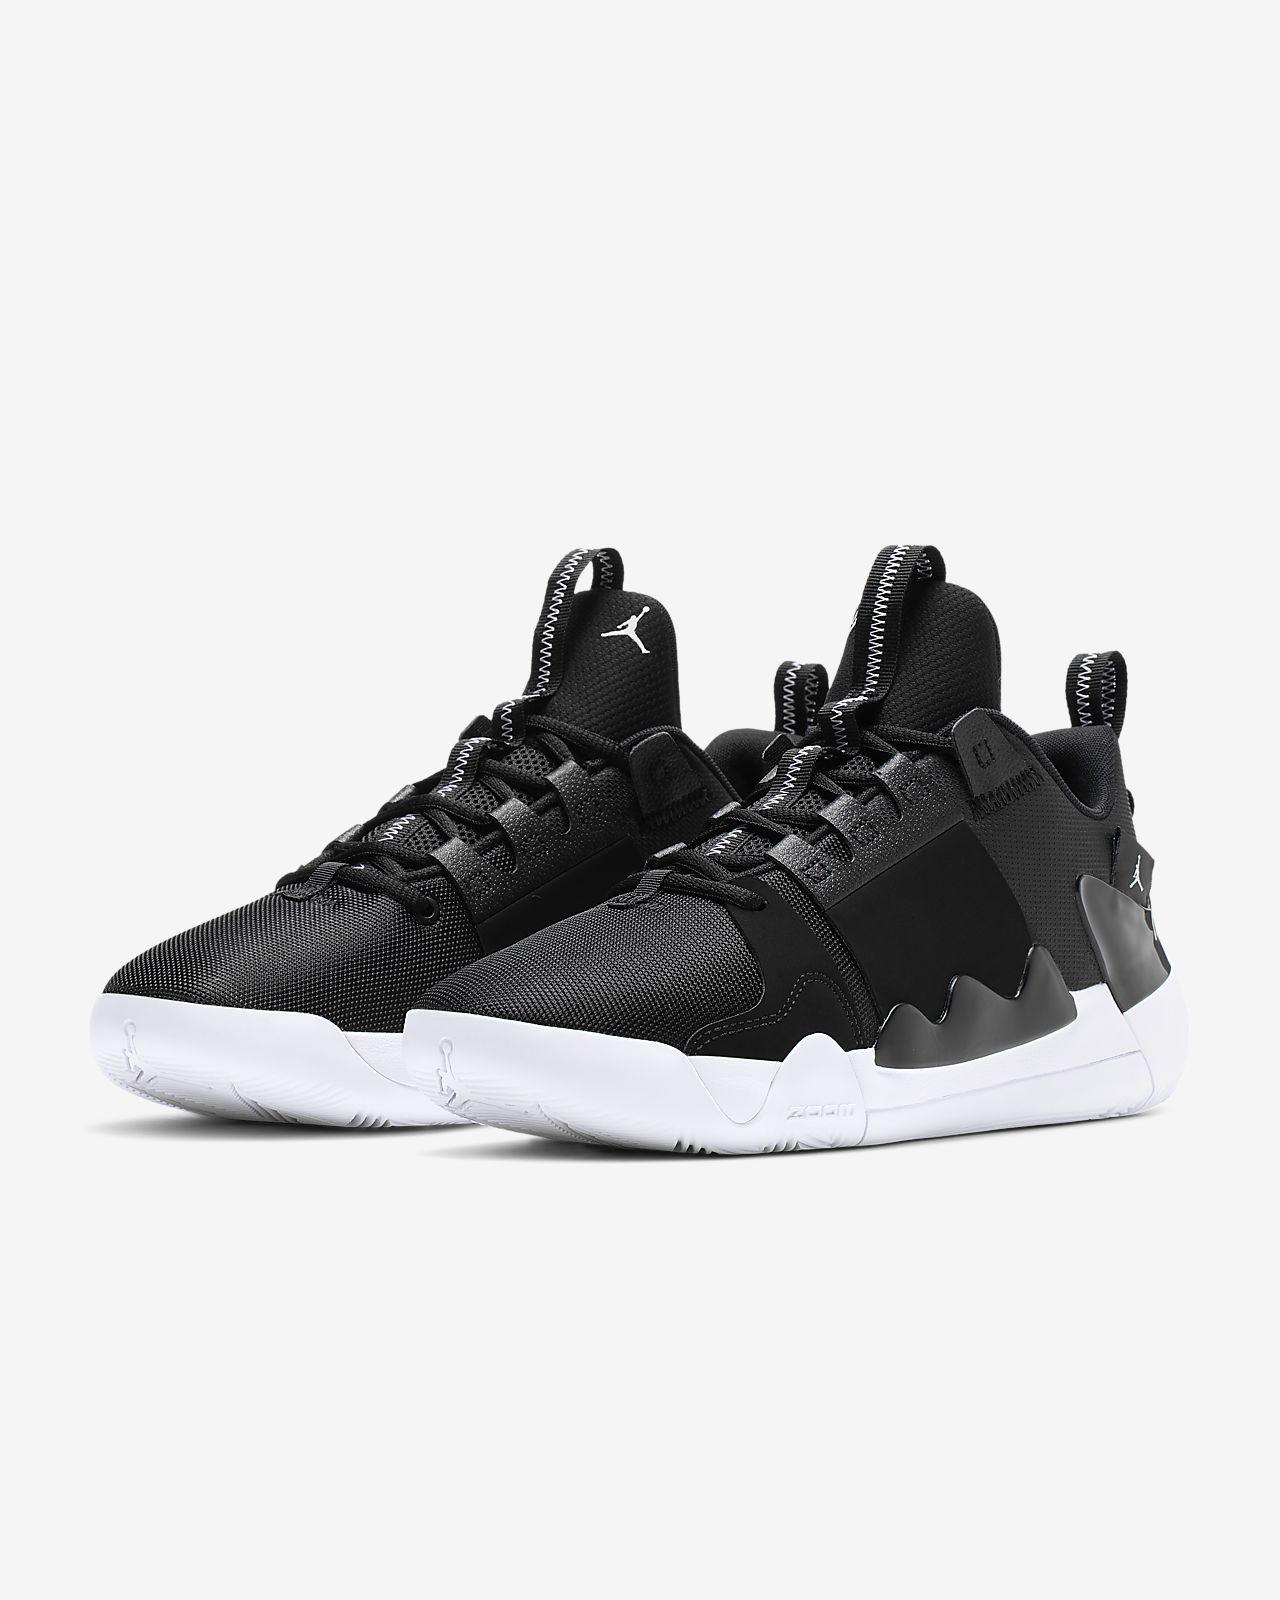 345fb1a87e8 Jordan Zoom Zero Gravity Basketball Shoe. Nike.com ID